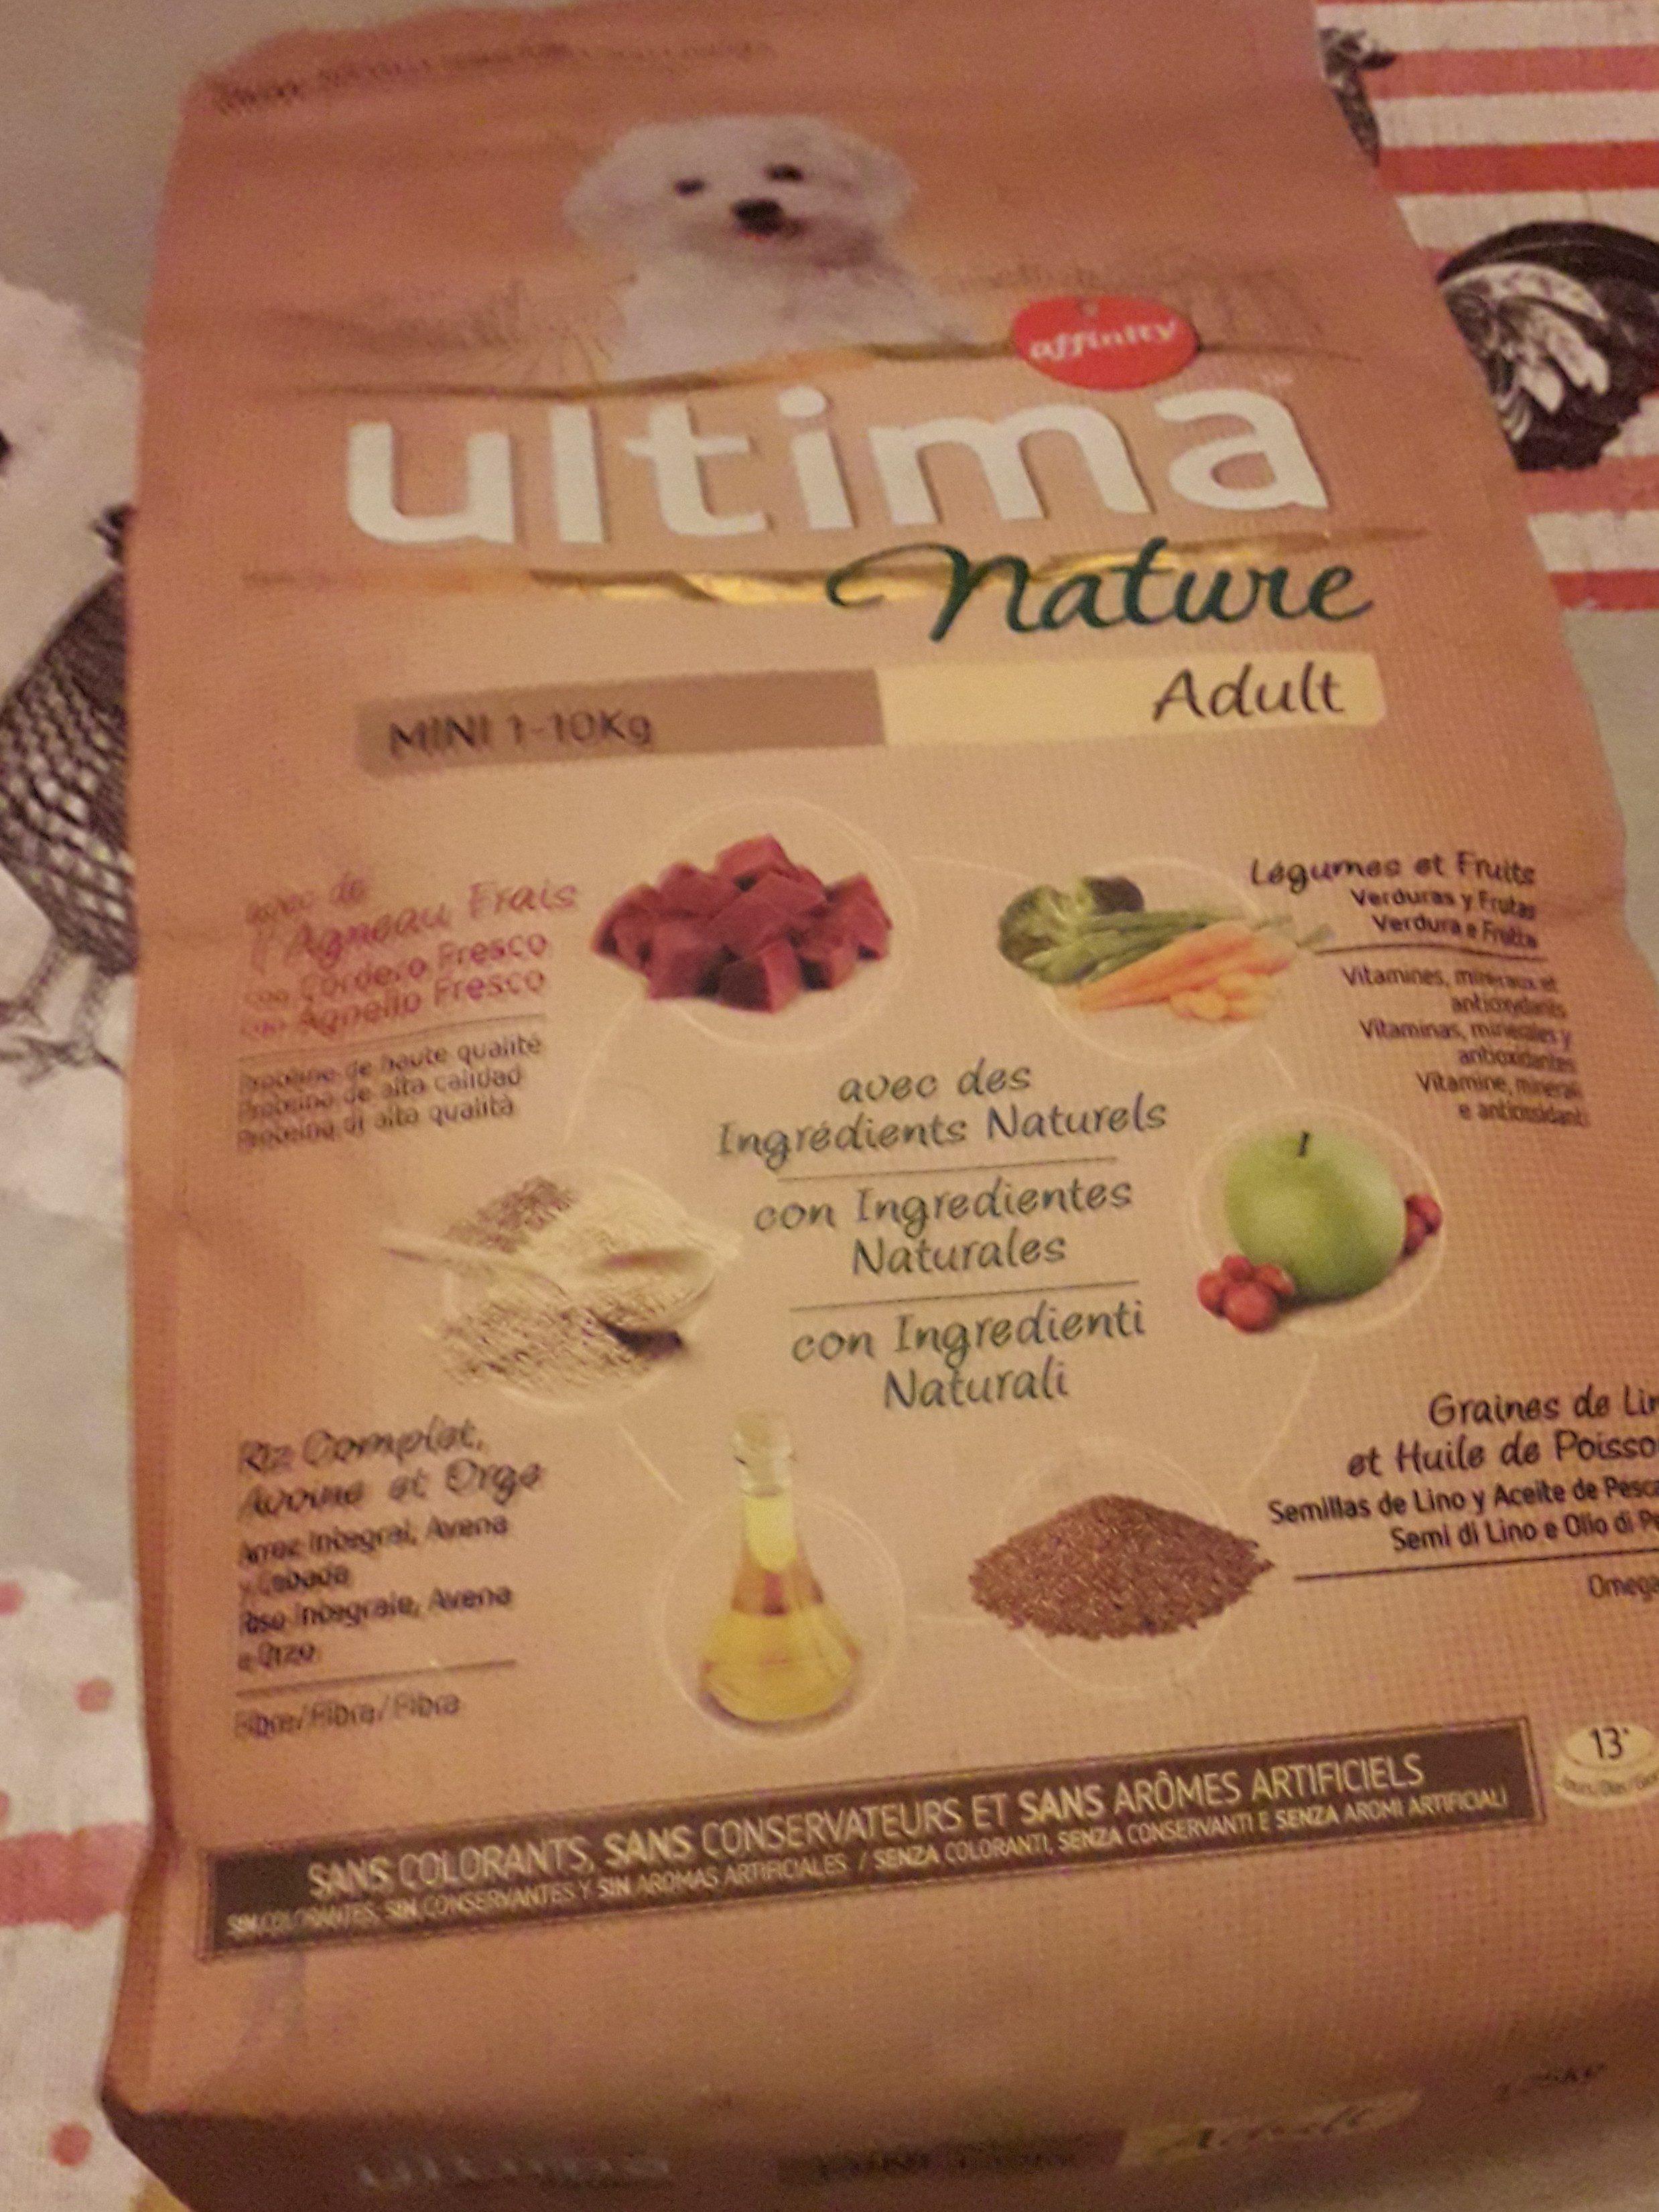 Comida Para Perros Mini Ultima Nature Cordero 1,25 KG - Product - fr